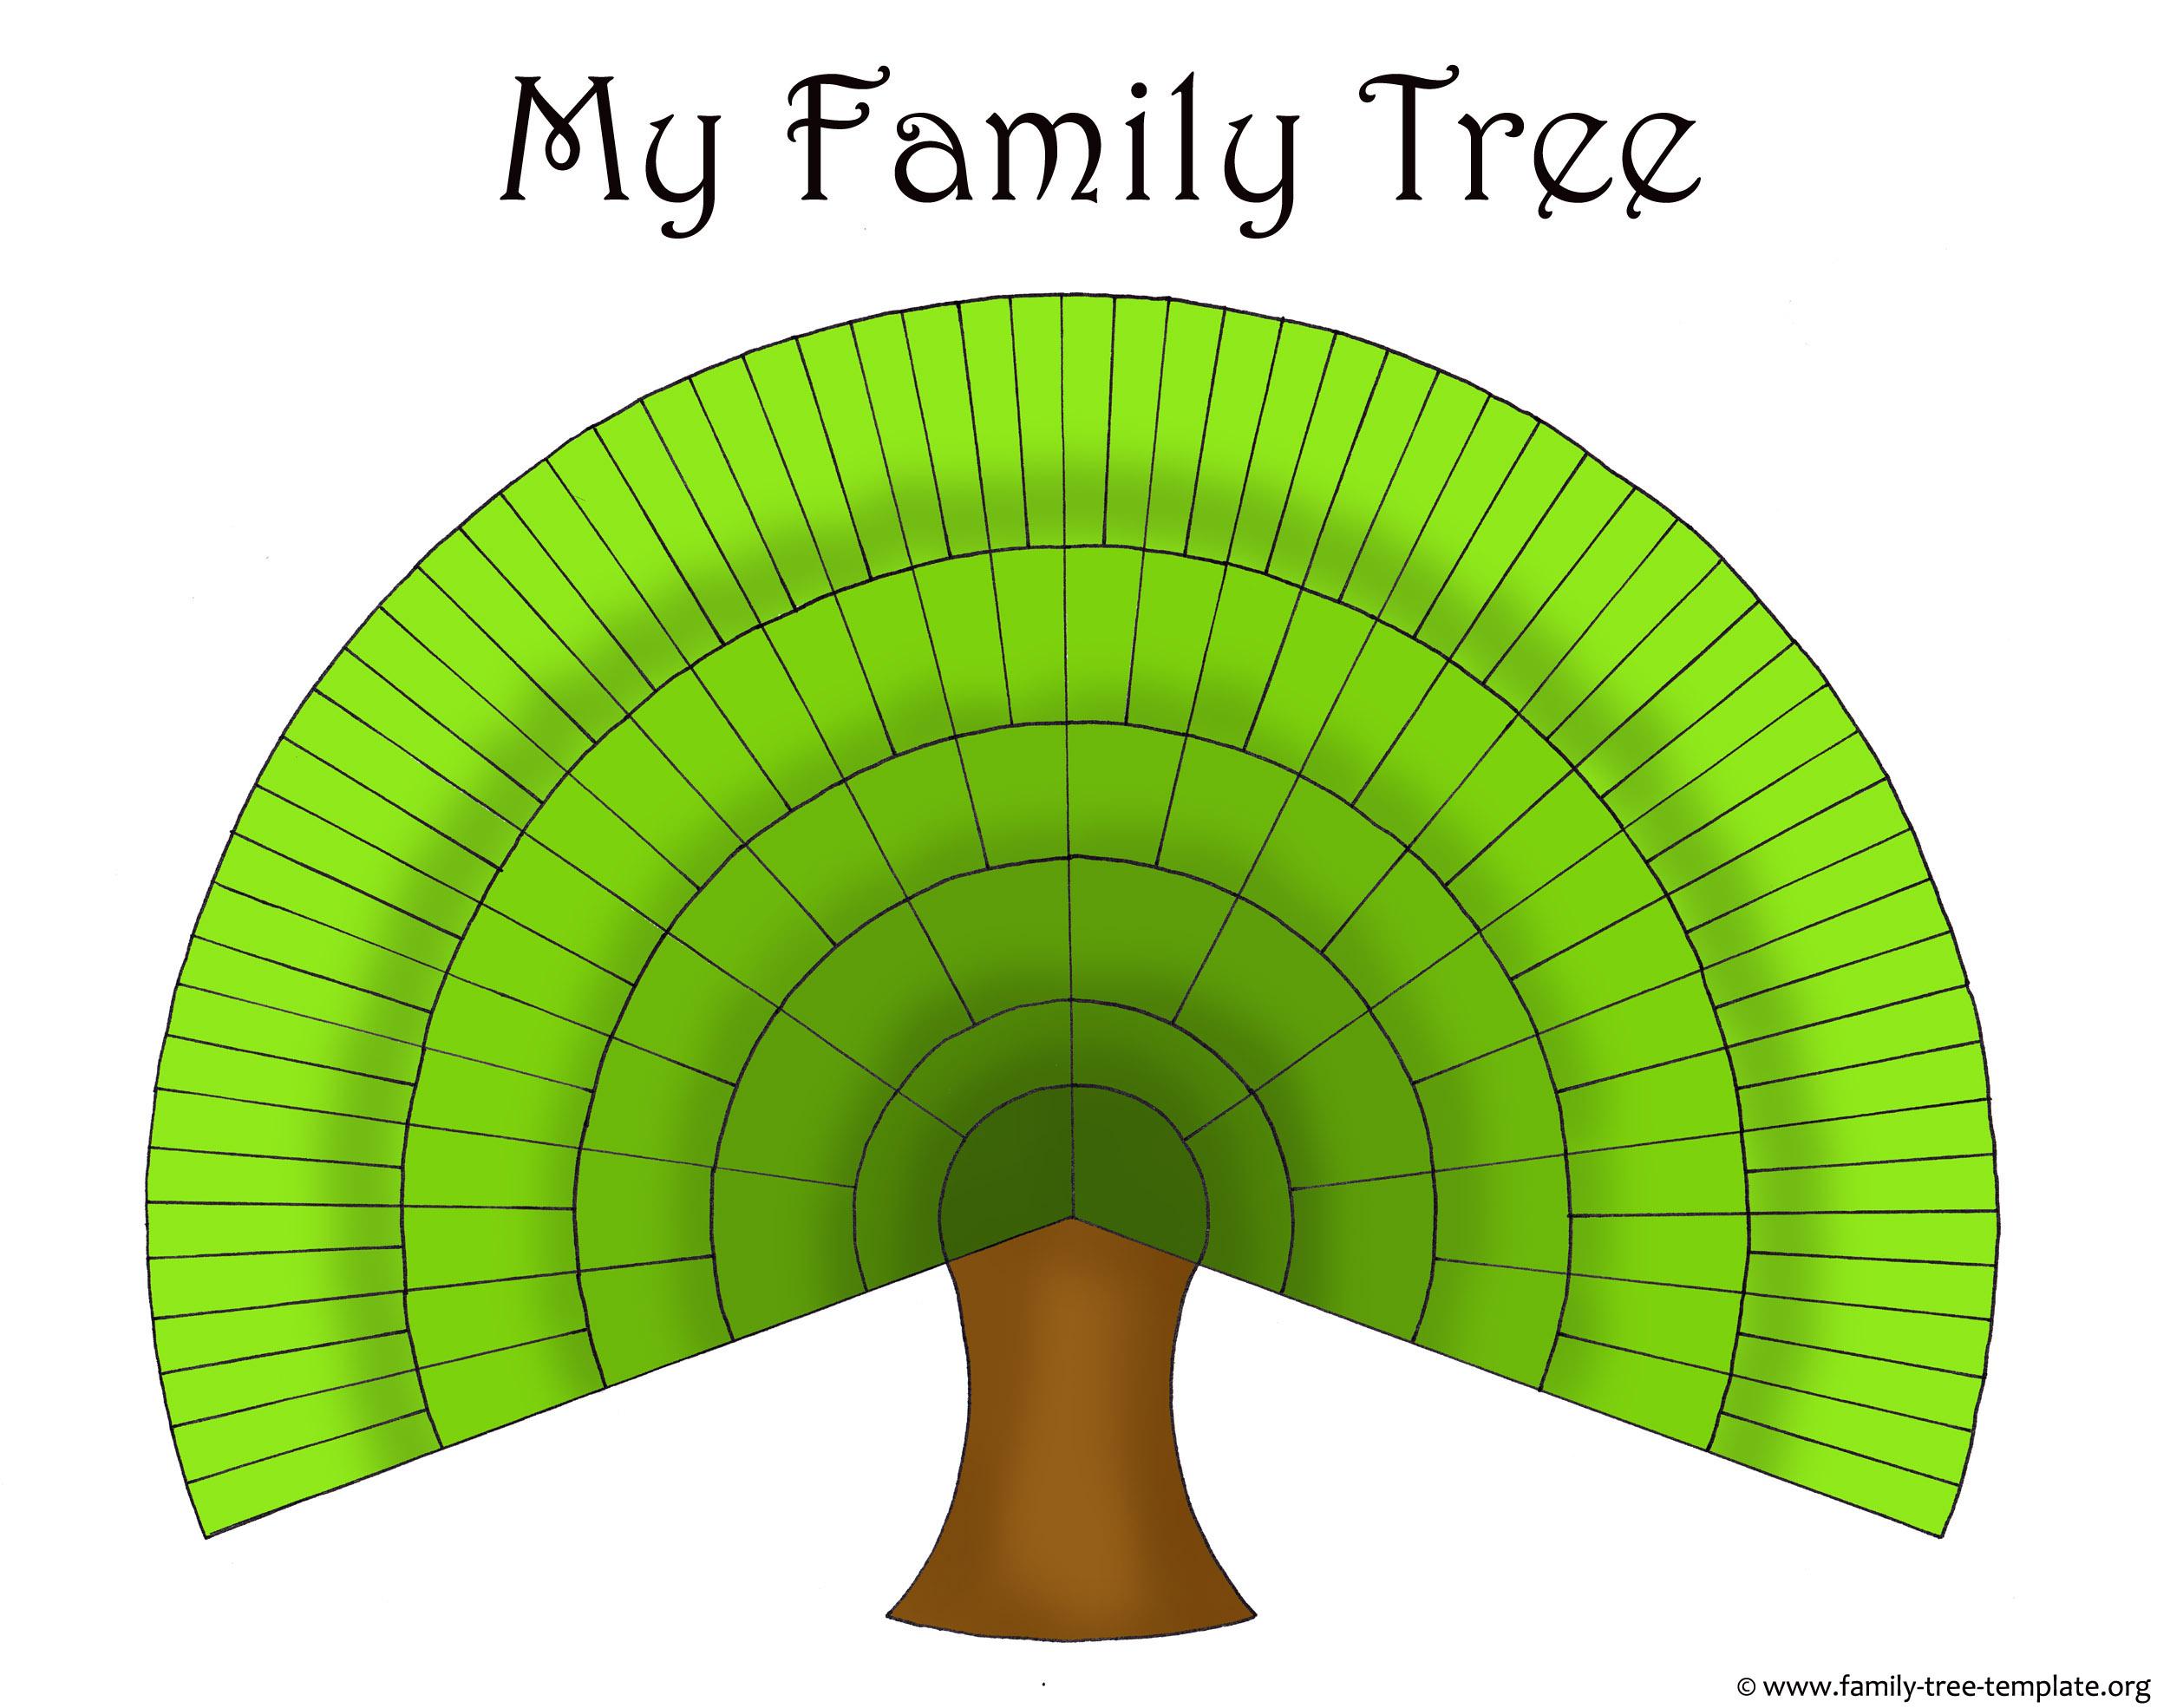 Clipart Family Tree Maker